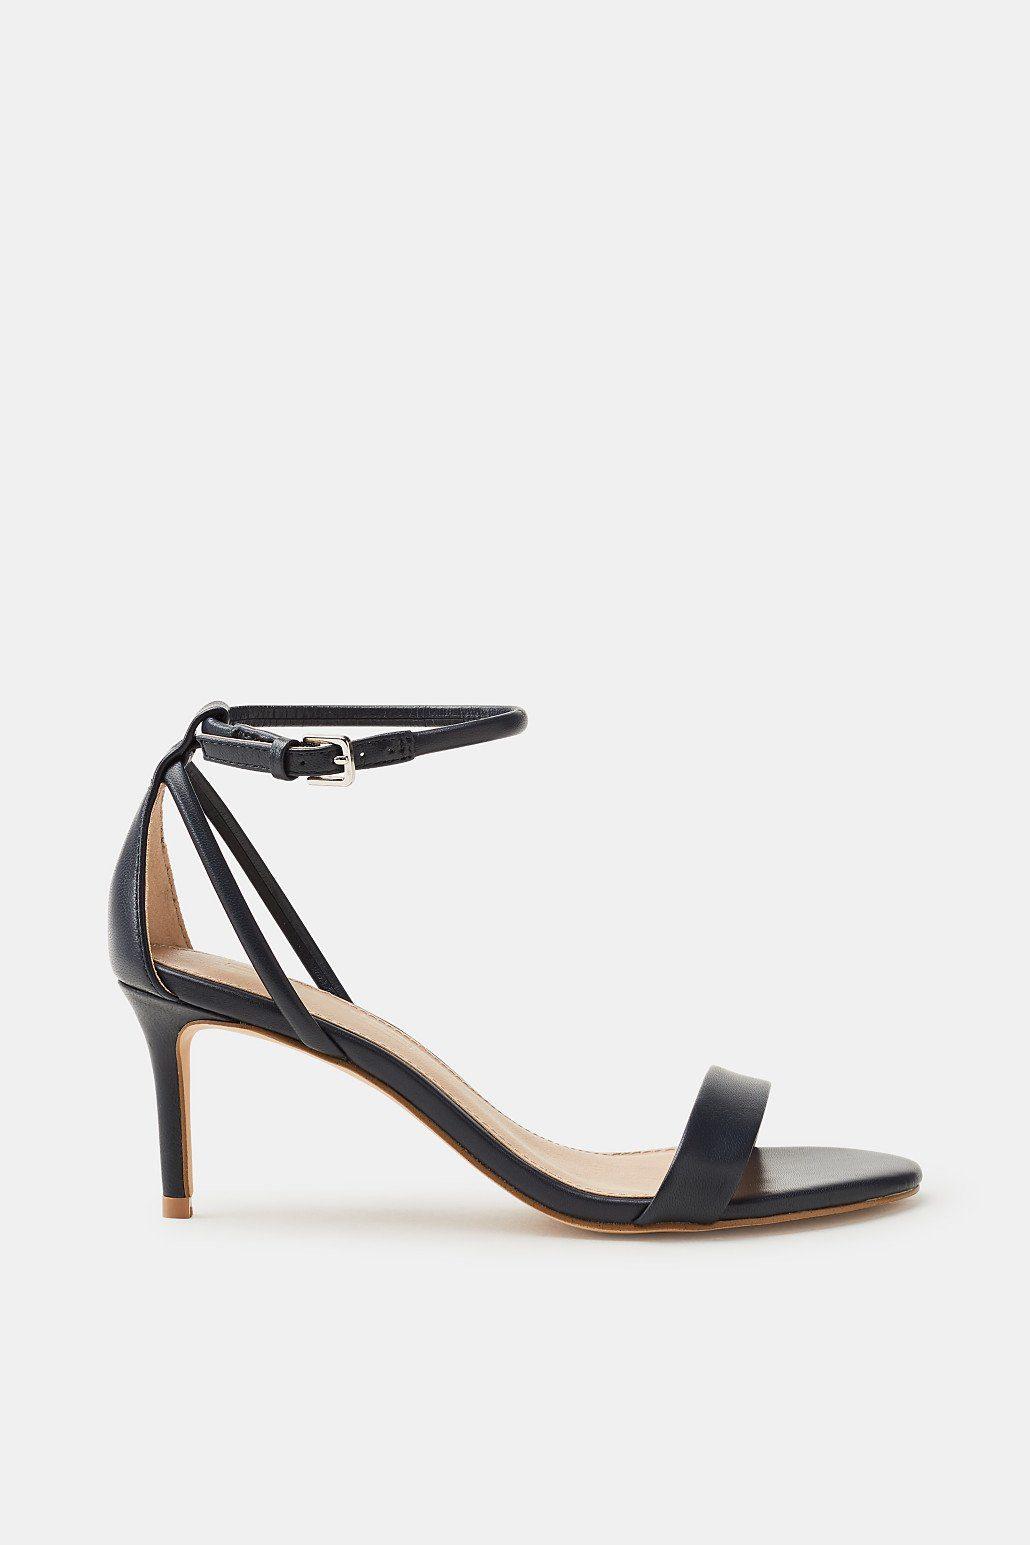 Esprit Elegante Sandalette aus Leder für Damen, Größe 38, Light Blue